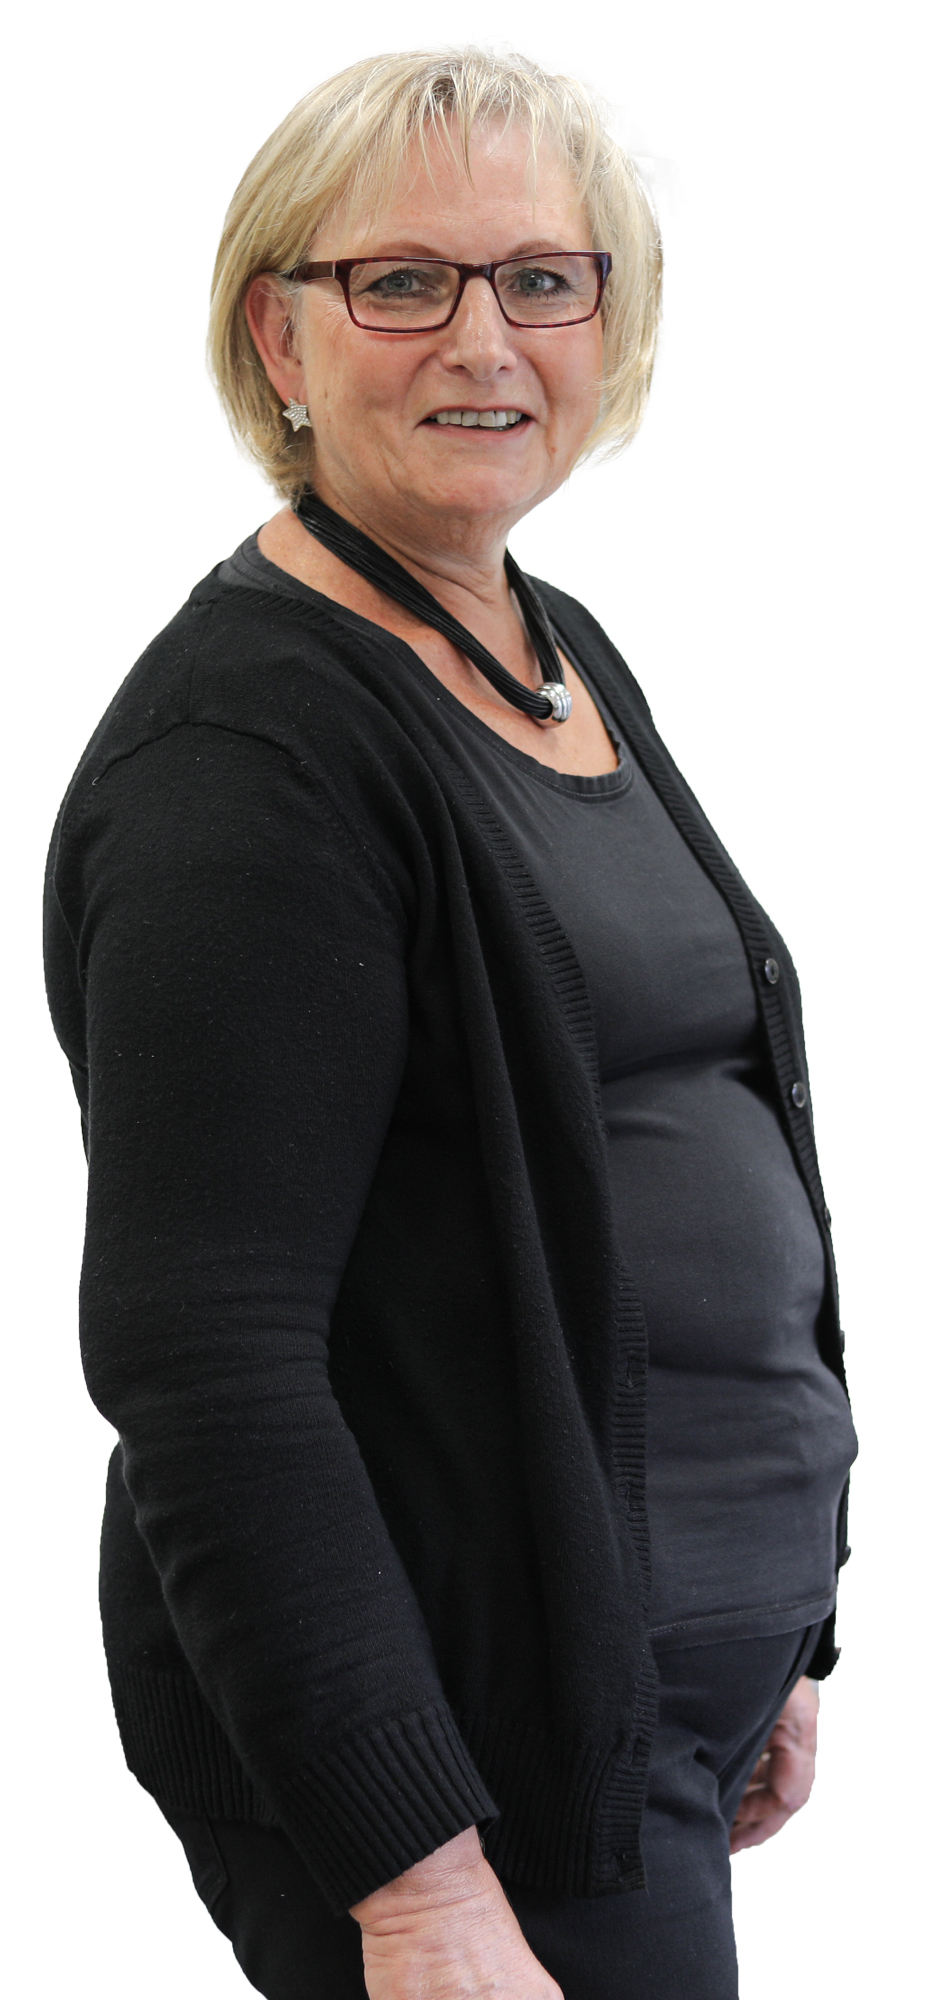 Anita Remkamp